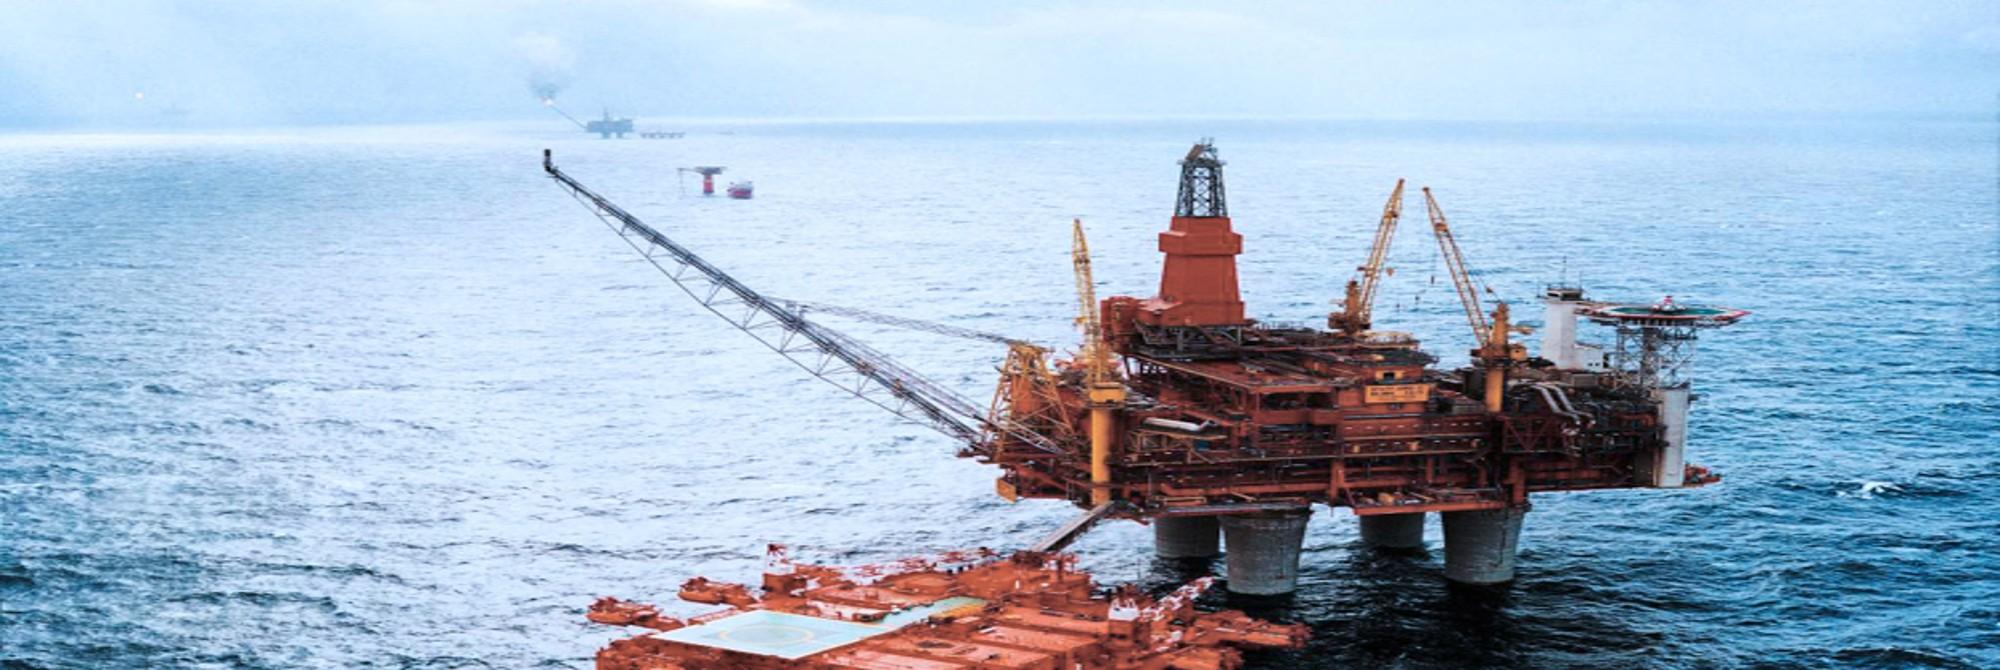 oil industry thyssenkrupp materials na